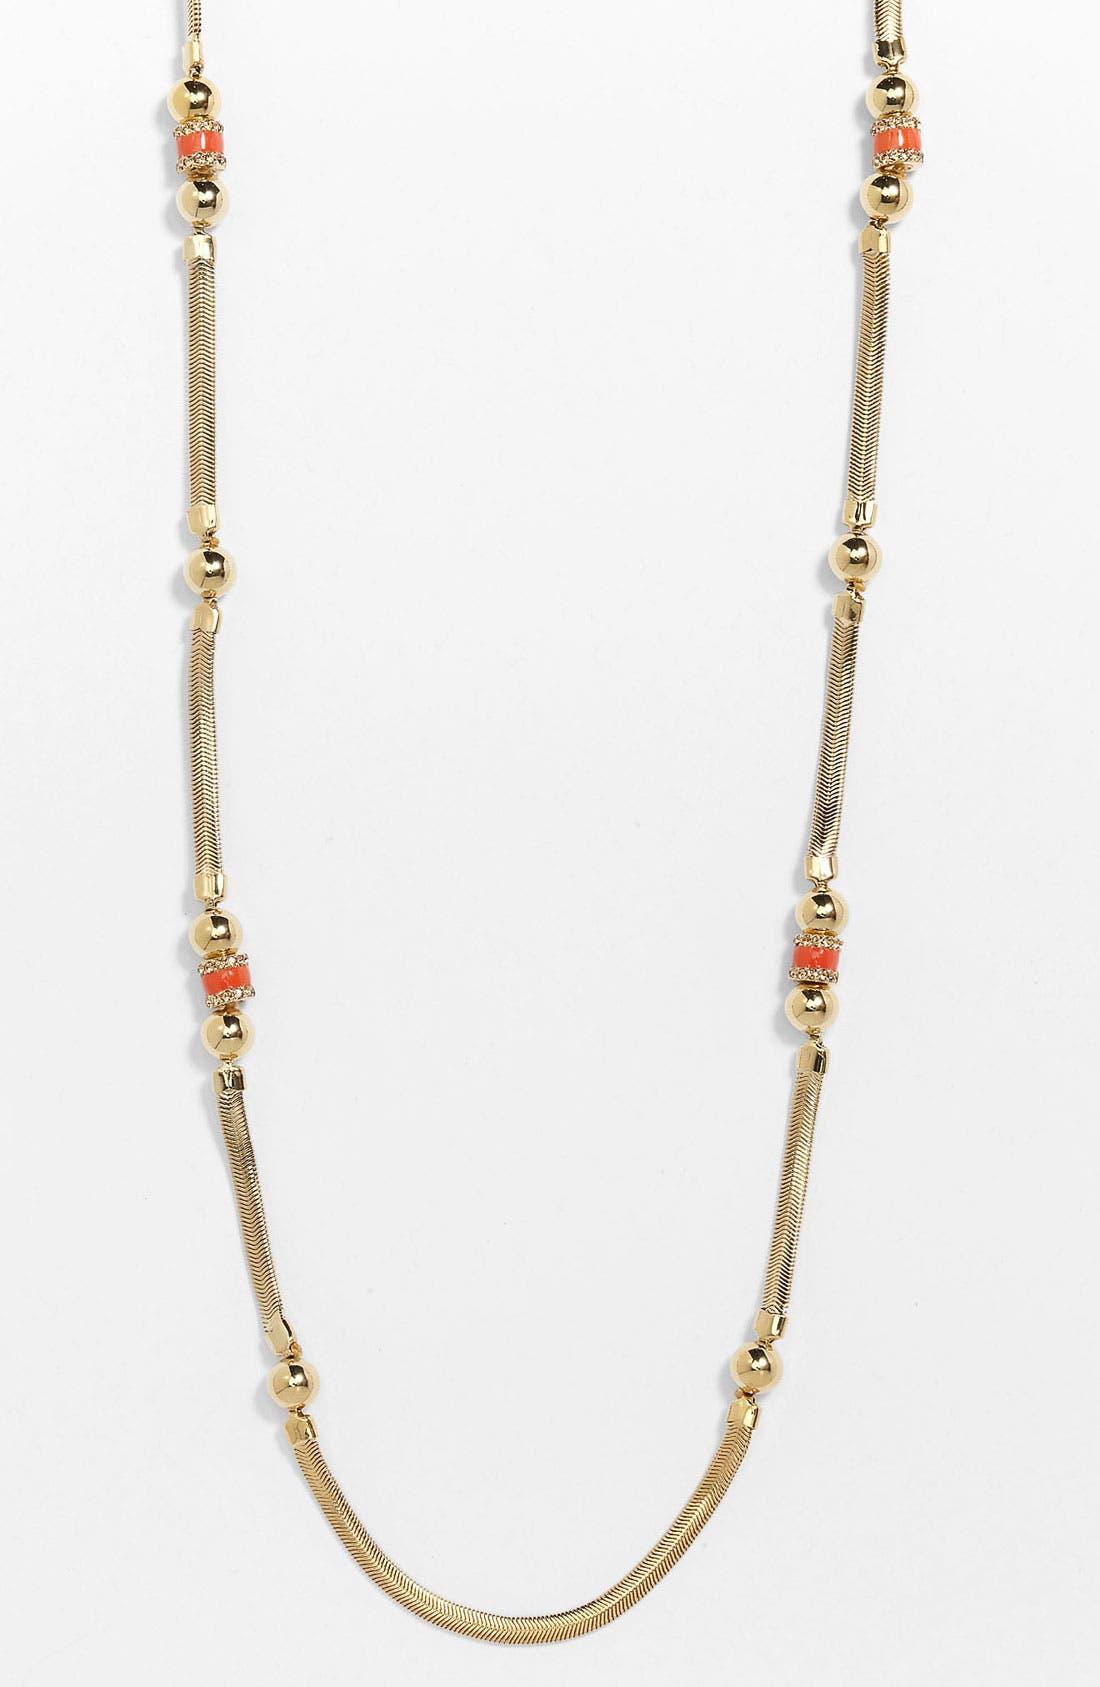 Alternate Image 1 Selected - Givenchy 'Harvest' Long Station Necklace